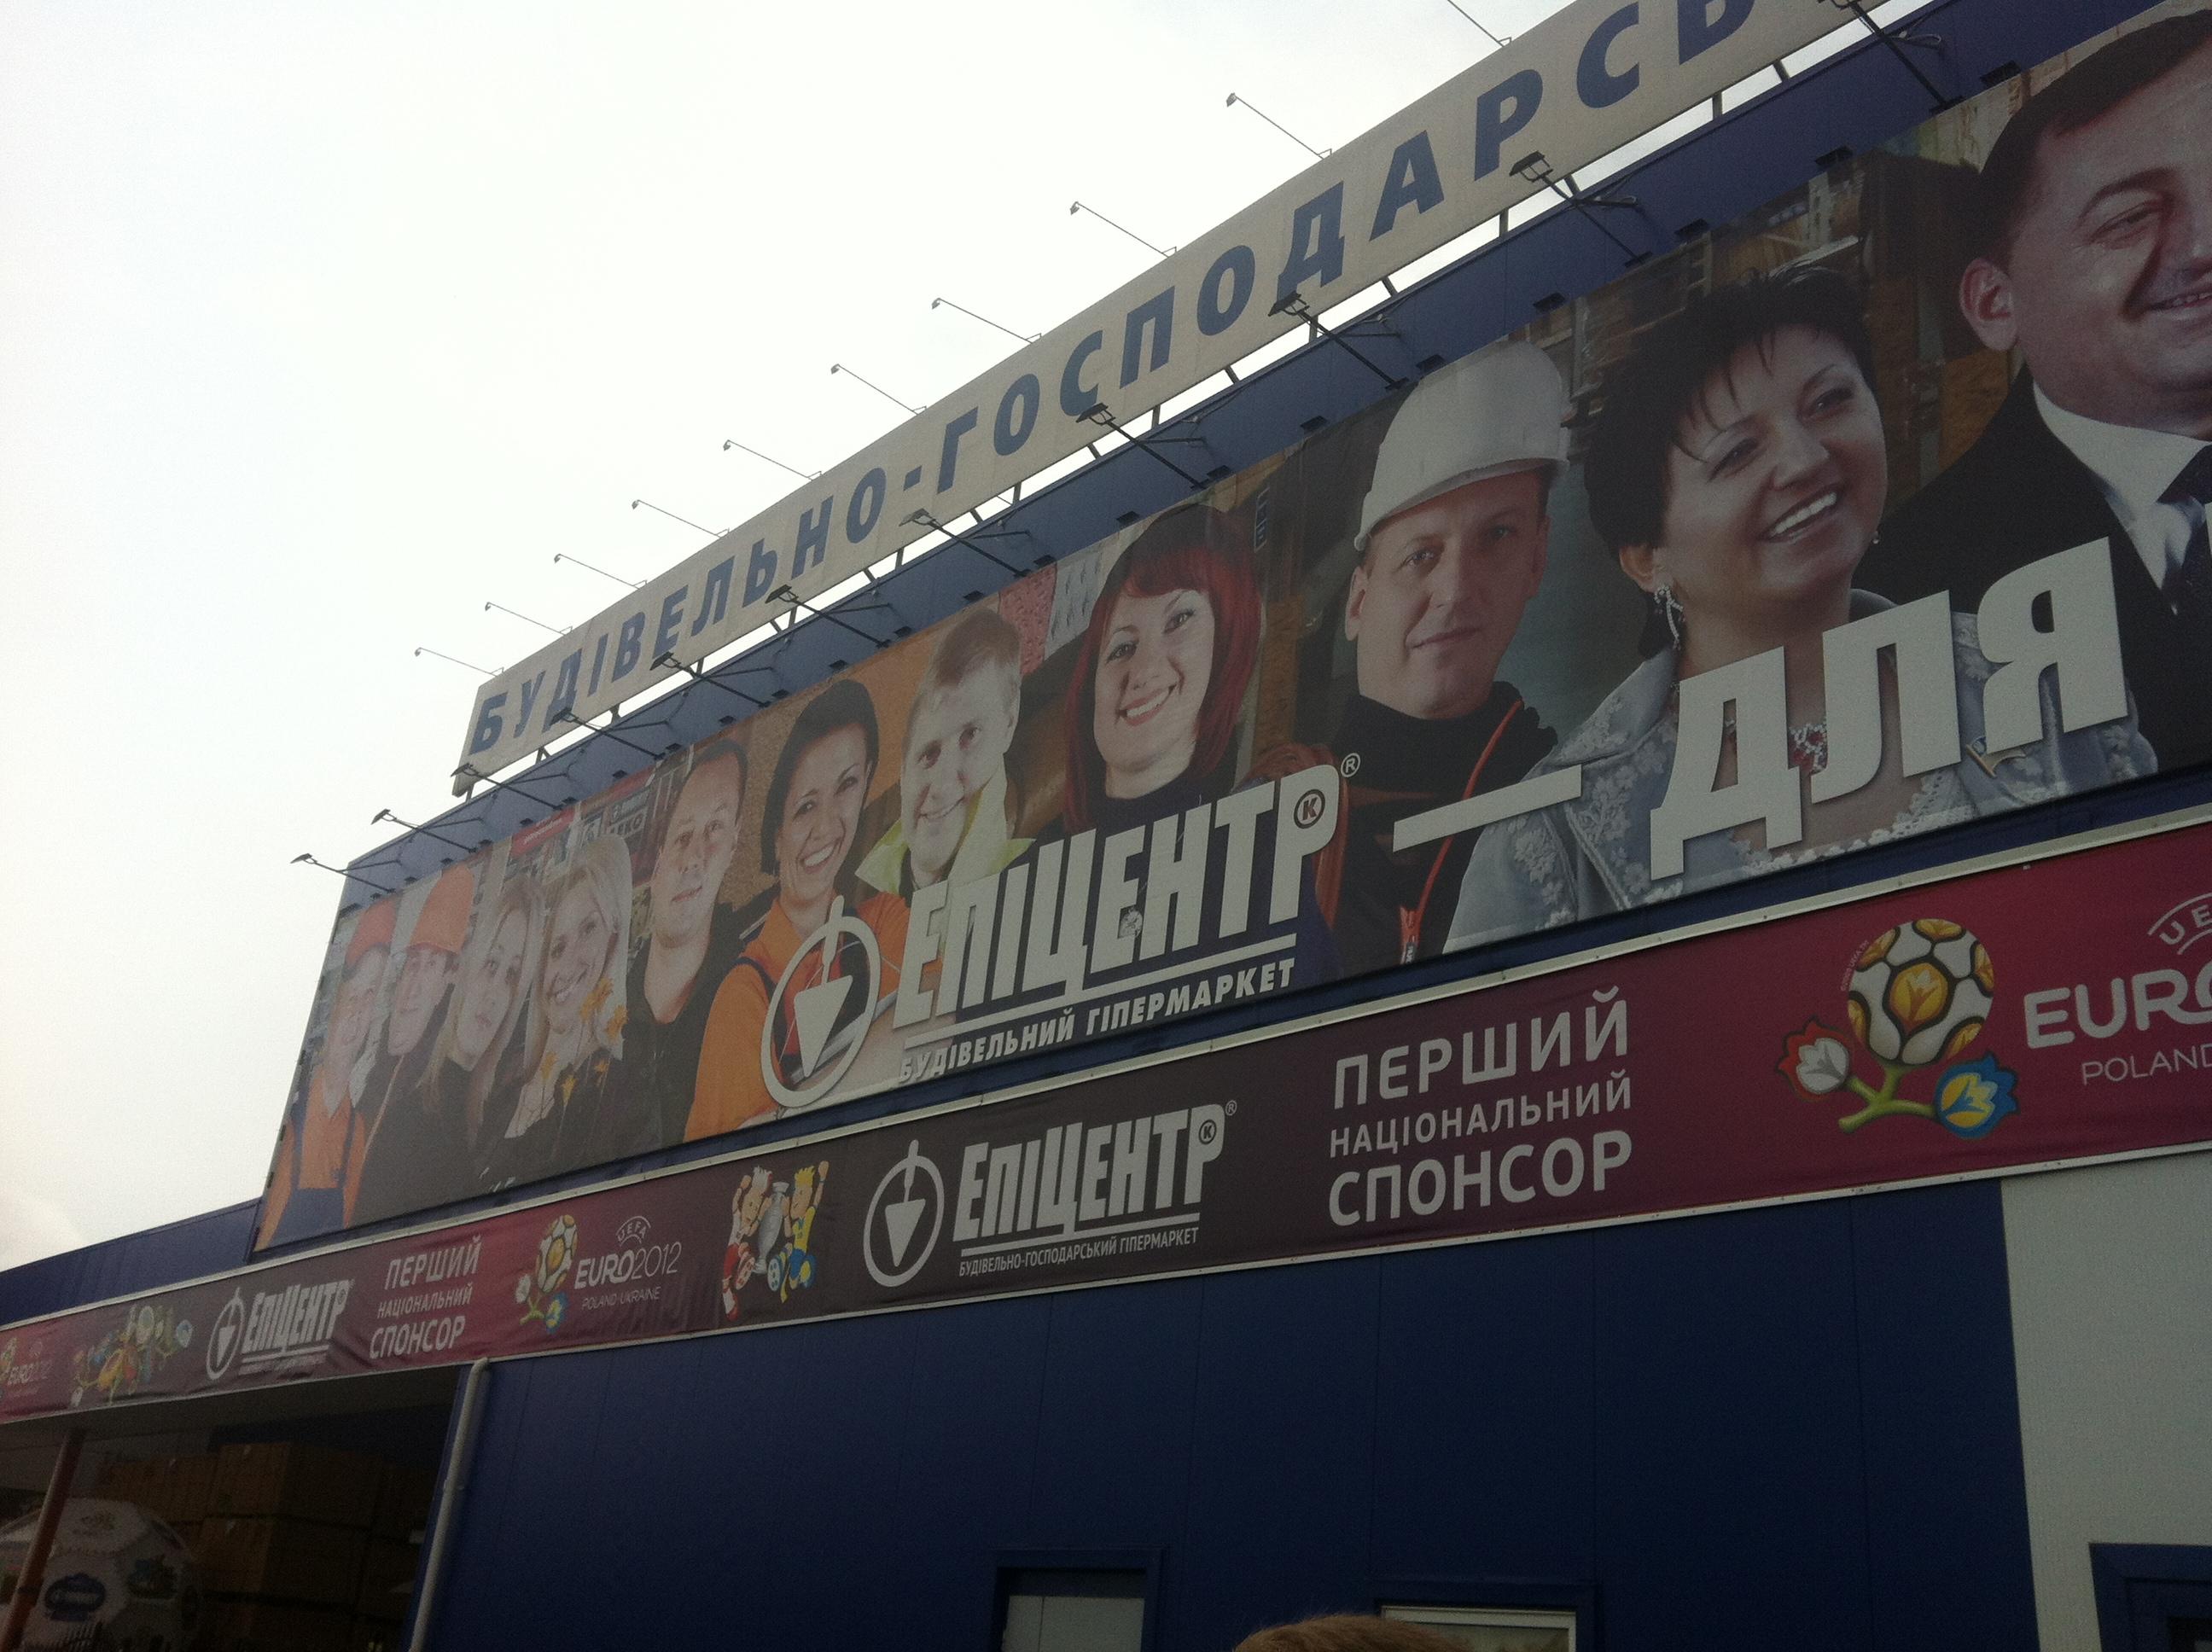 Signage outside of Epicenter, a Ukrainian superstore